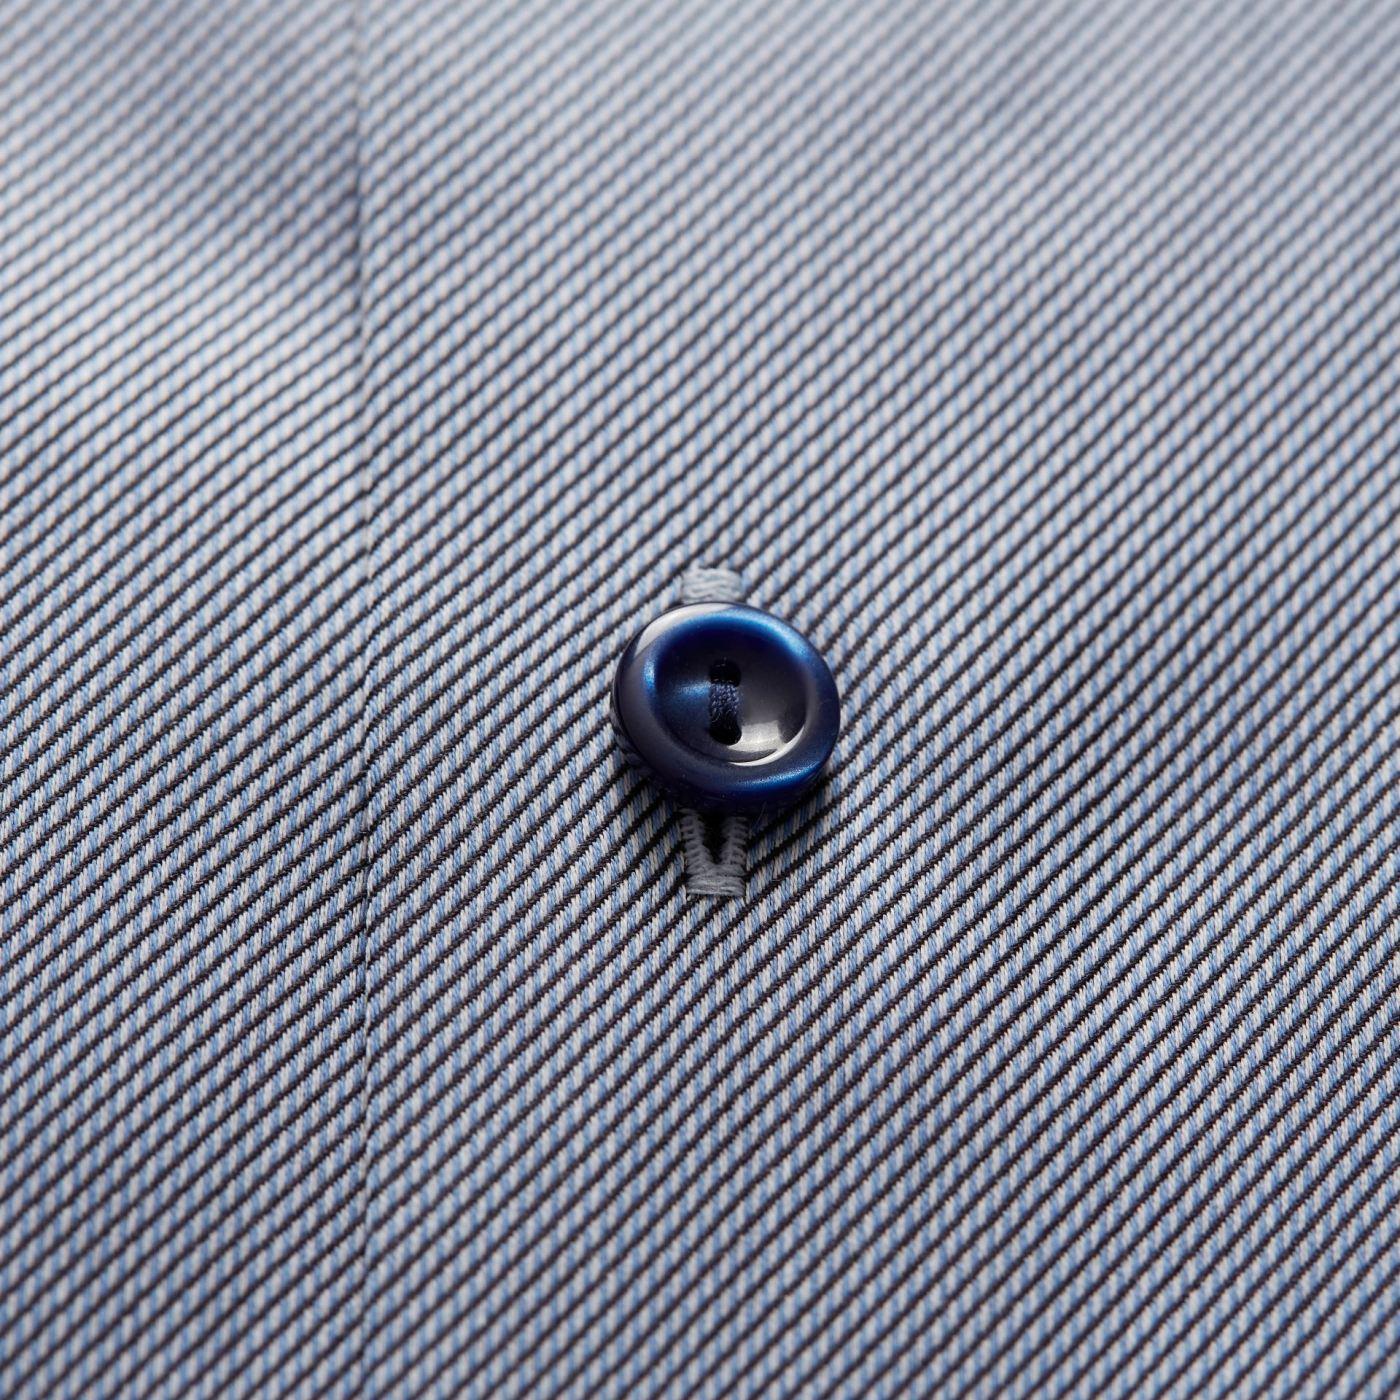 ETON NAVY GEOMETRIC PRINT SHIRT WITH NAVY BLUE BUTTONS